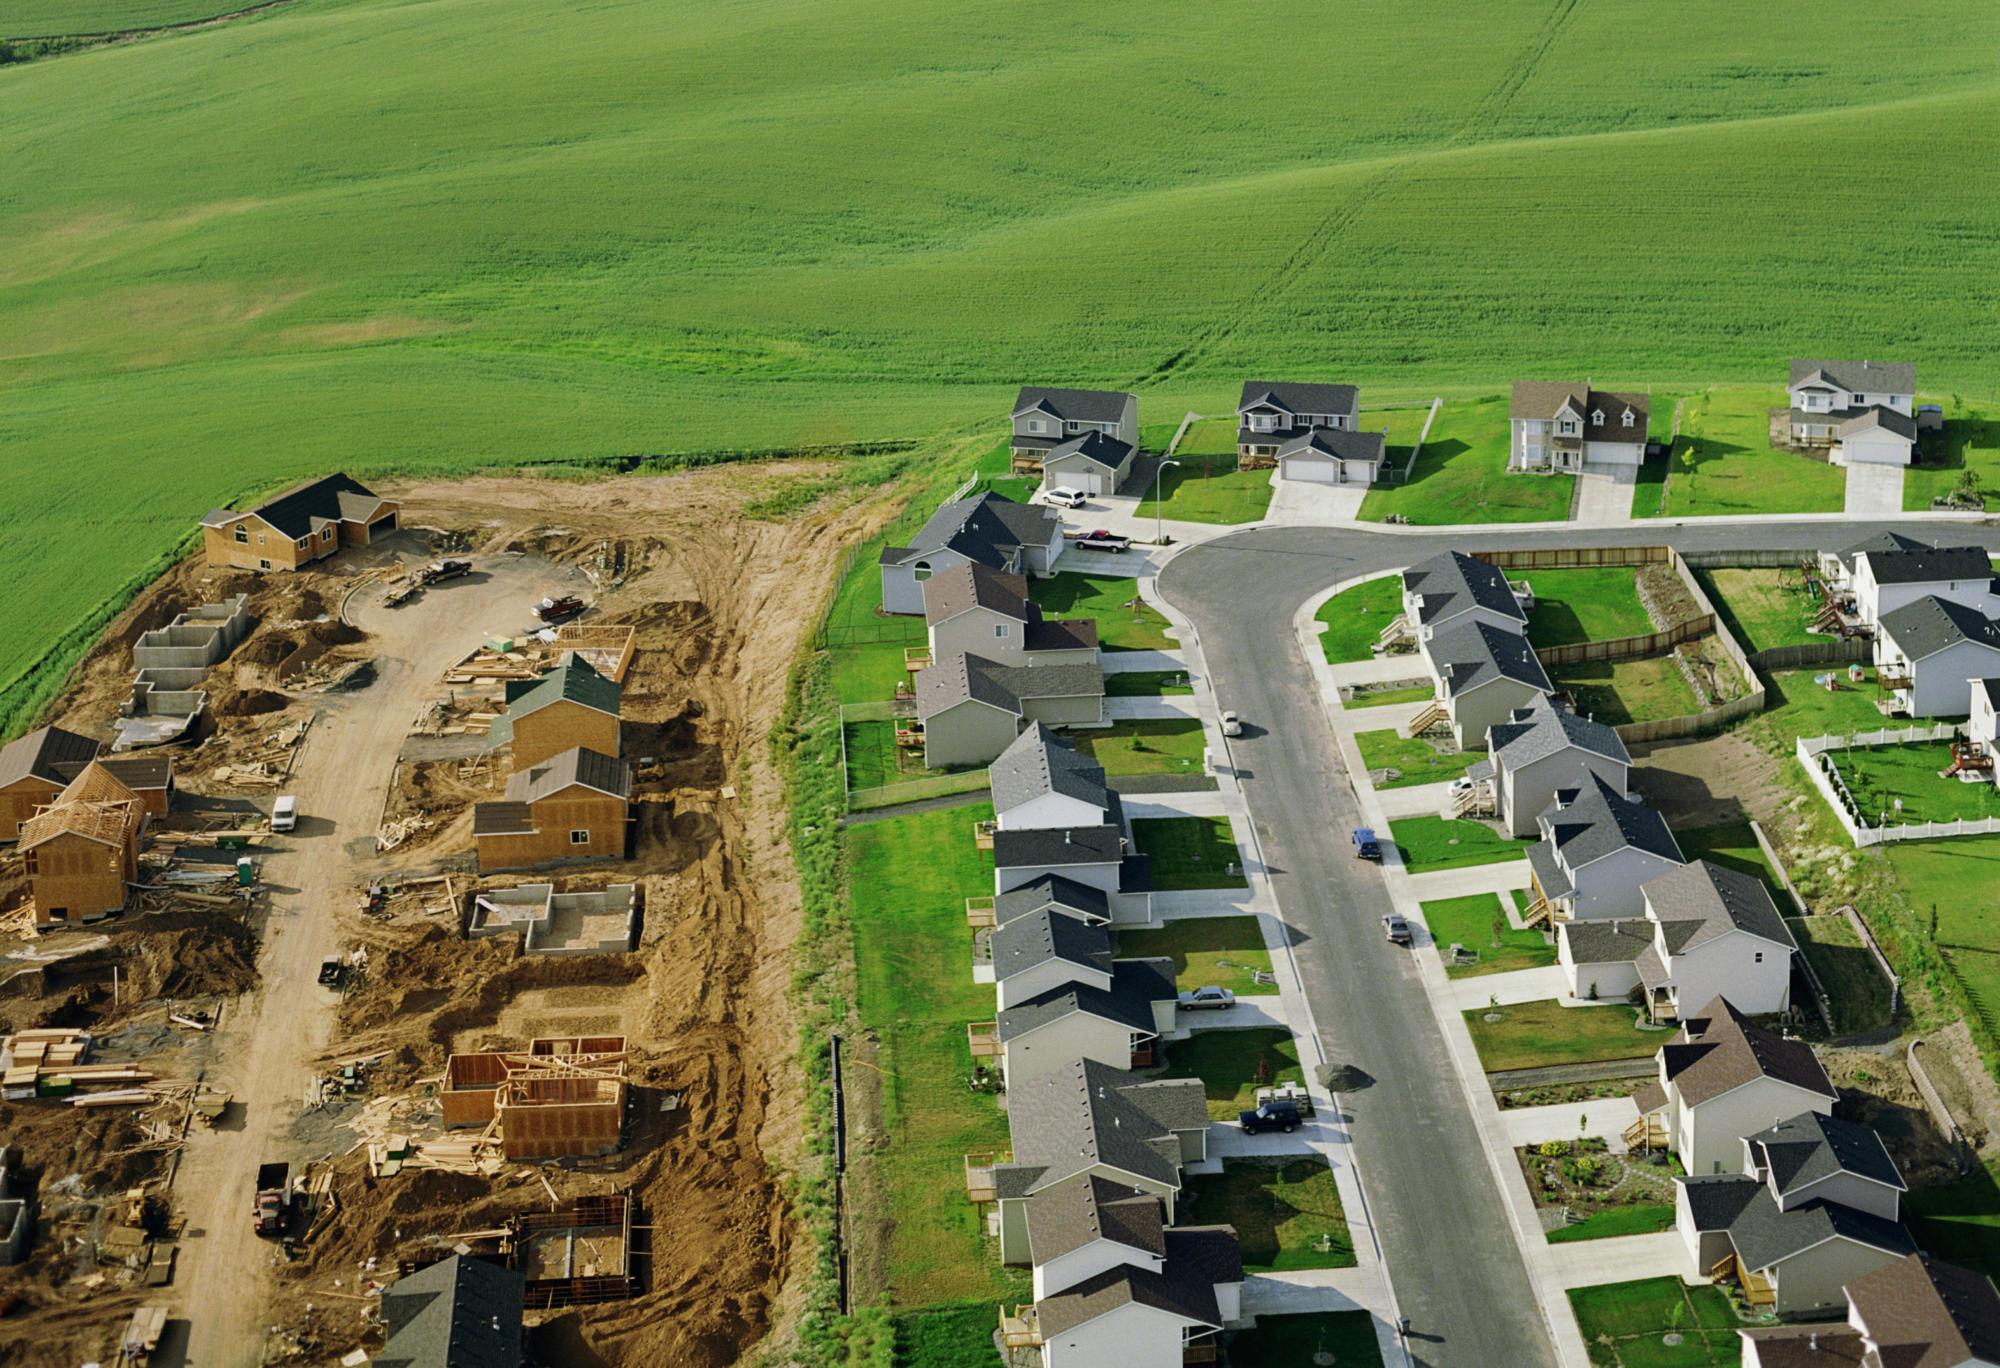 Housing development under construction on farmalnd, aerial view.